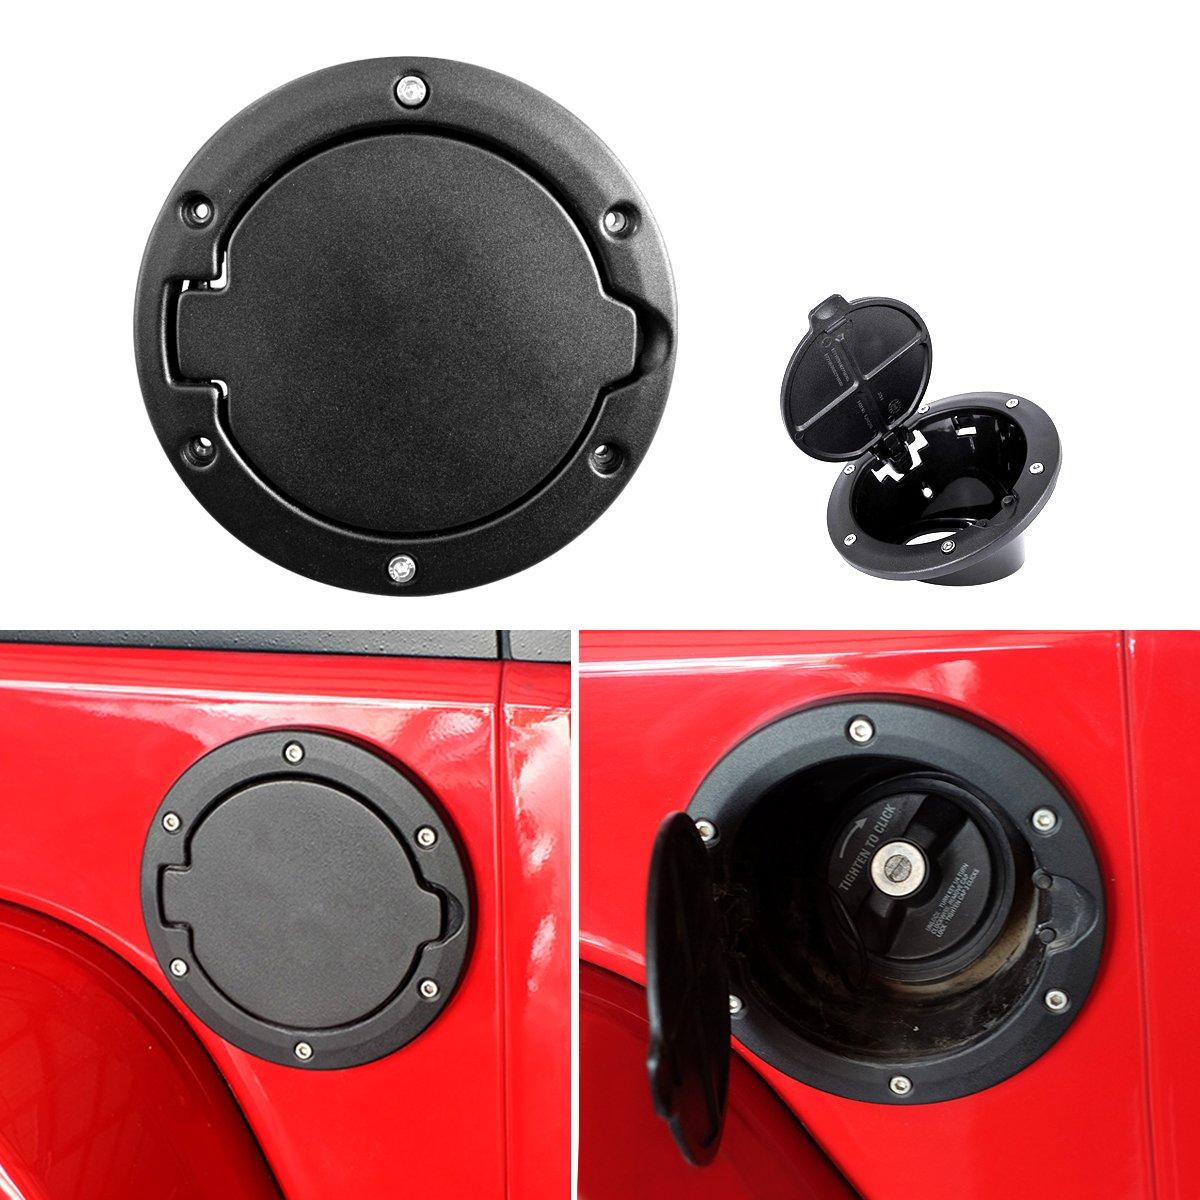 ICARS Jeep Wrangler Gas Cap Cover Fuel Door Cover Black Carbon Fiber Jeep Wrangler Accessories JK JKU & Unlimited Rubicon Sahara Sports 2007-2018